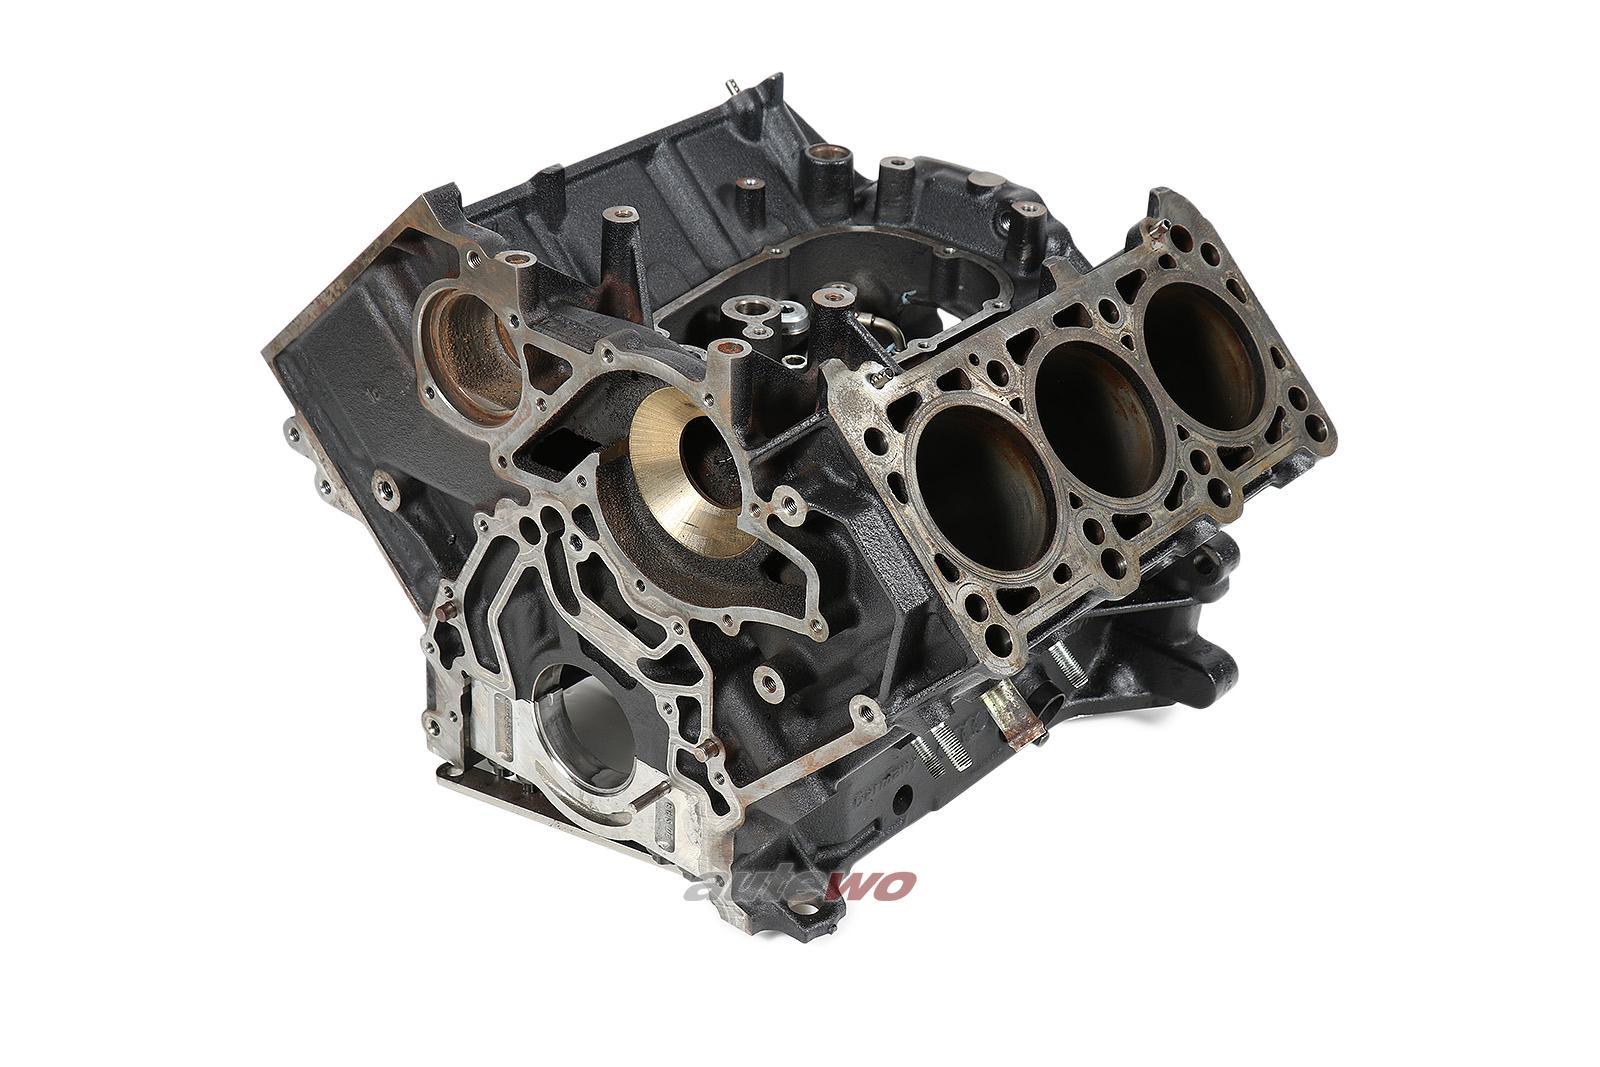 059103021K Audi/VW A4 B5/A6 4B/A8 D2/Passat 3B 2.5l AKN 034212 Motorblock